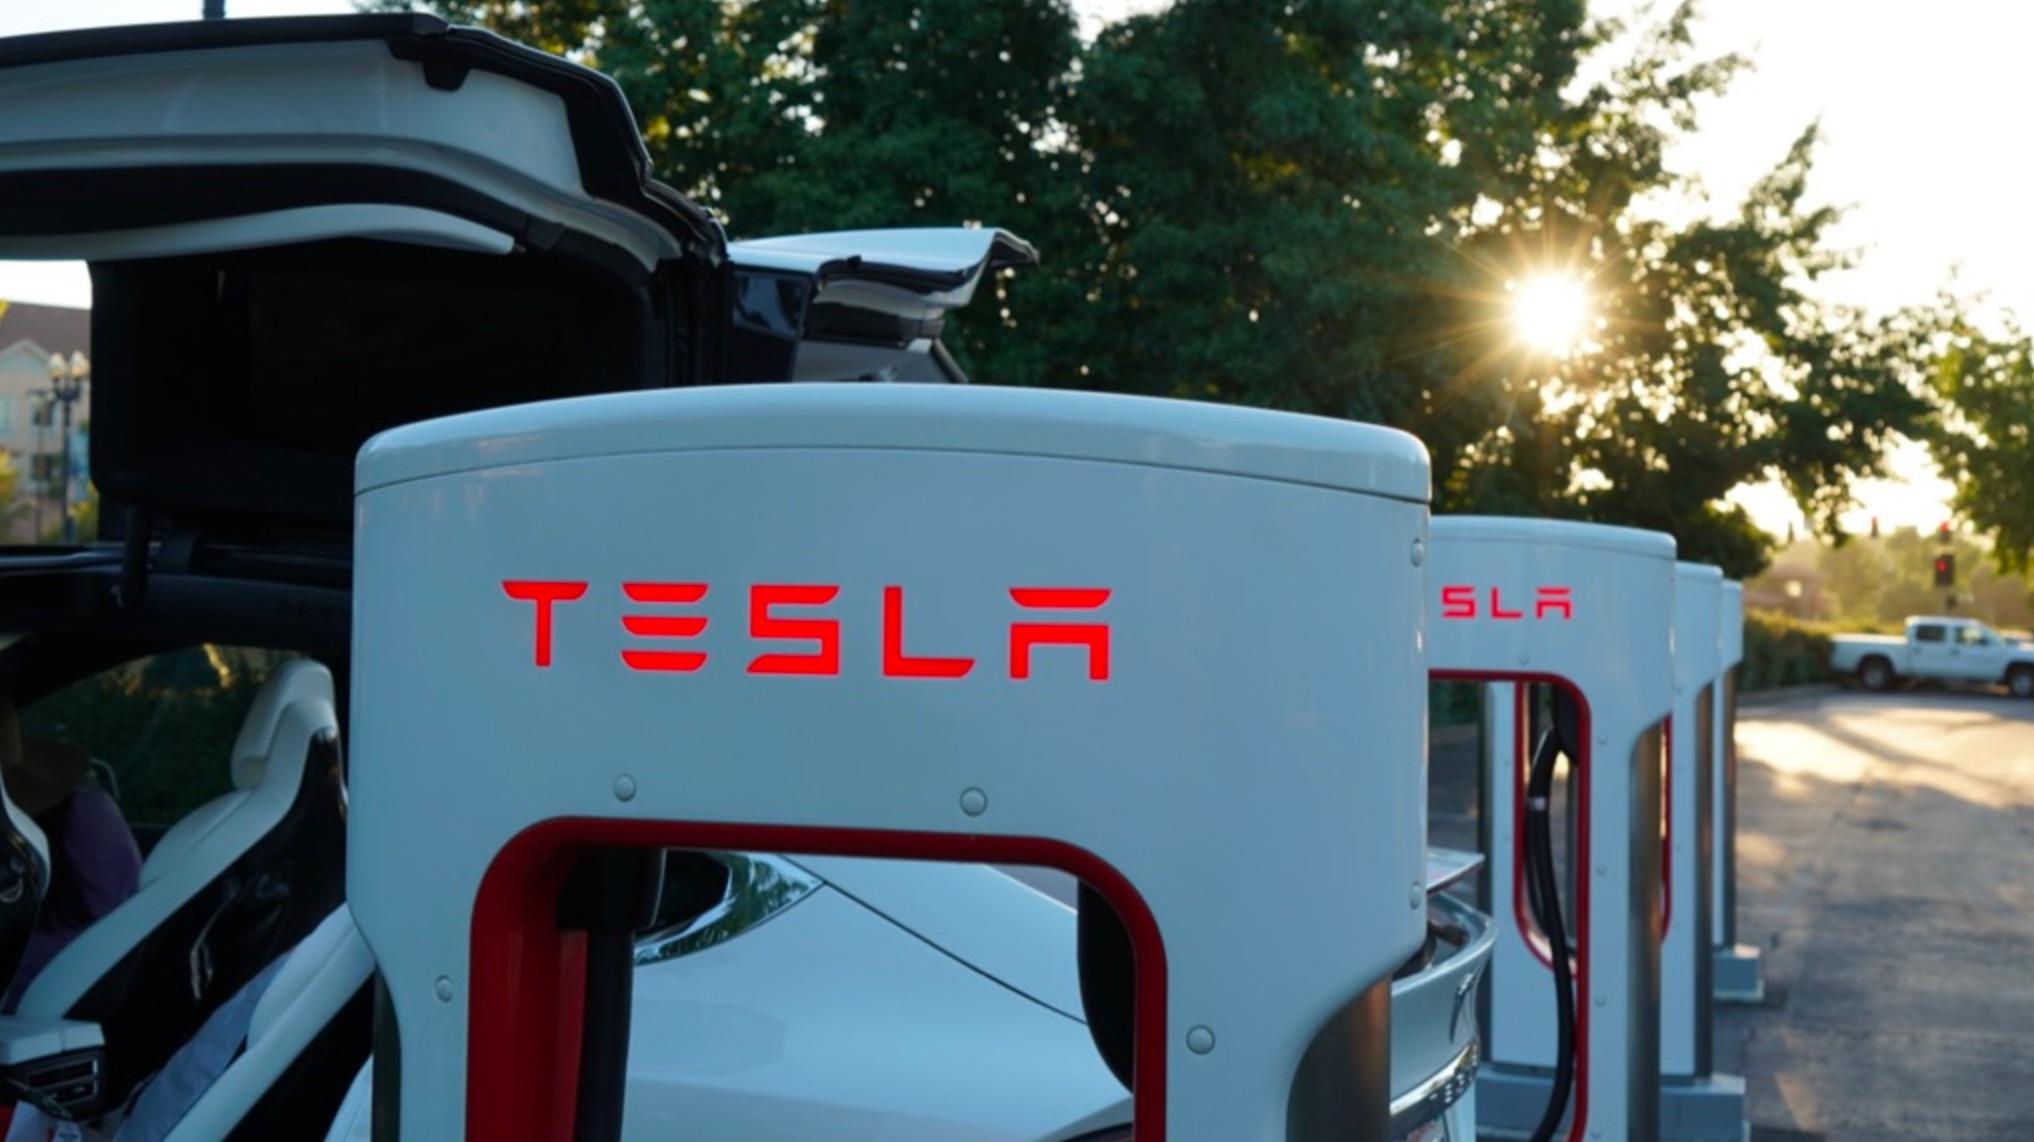 Tesla Nearing 1000 Supercharger Locations Worldwide Ahead